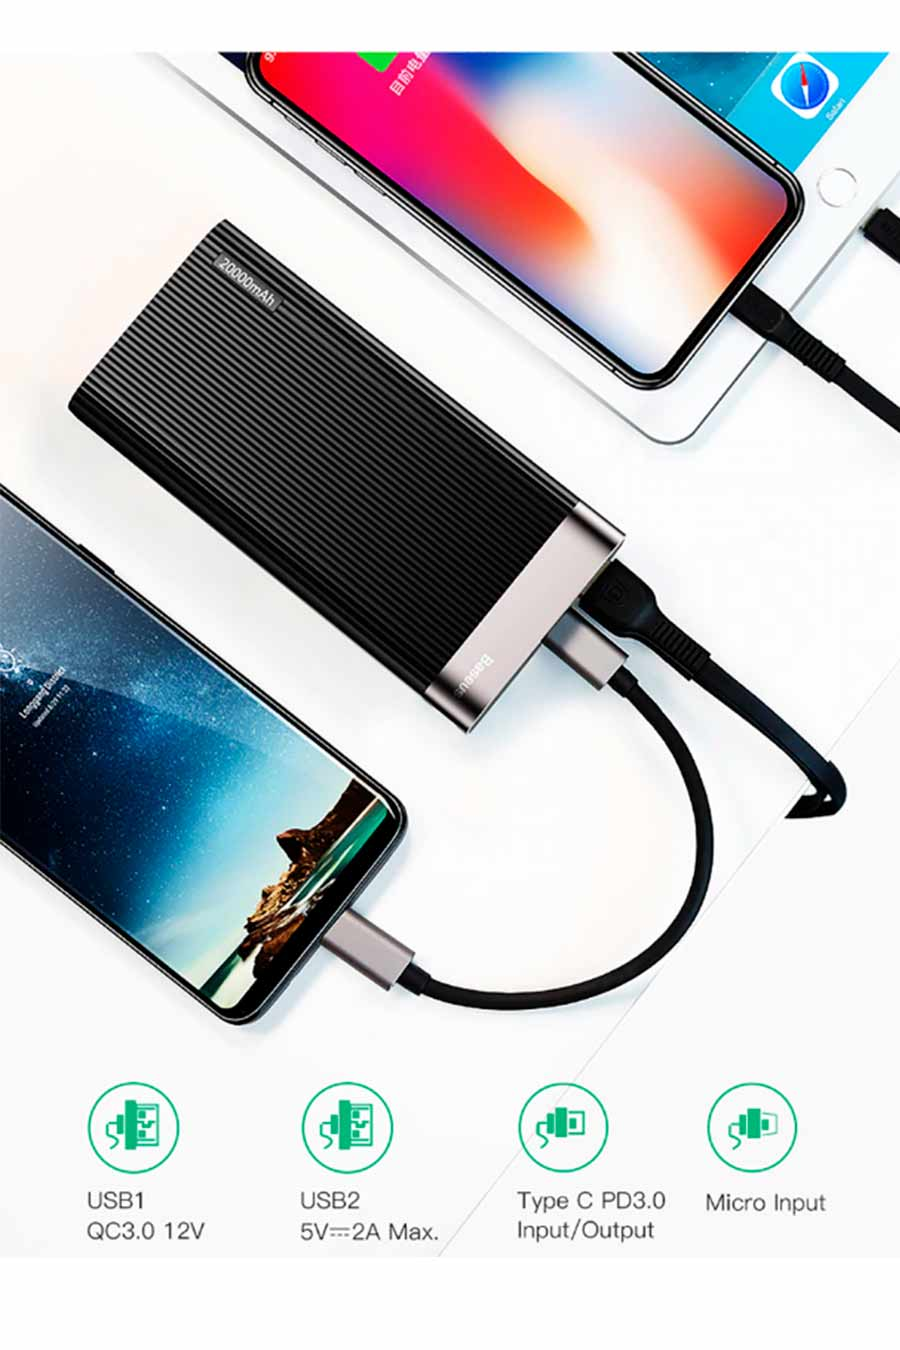 Power Bank Baseus Quick Charge 3.0 + PD 20000mAh Macbook  - KLIZZ